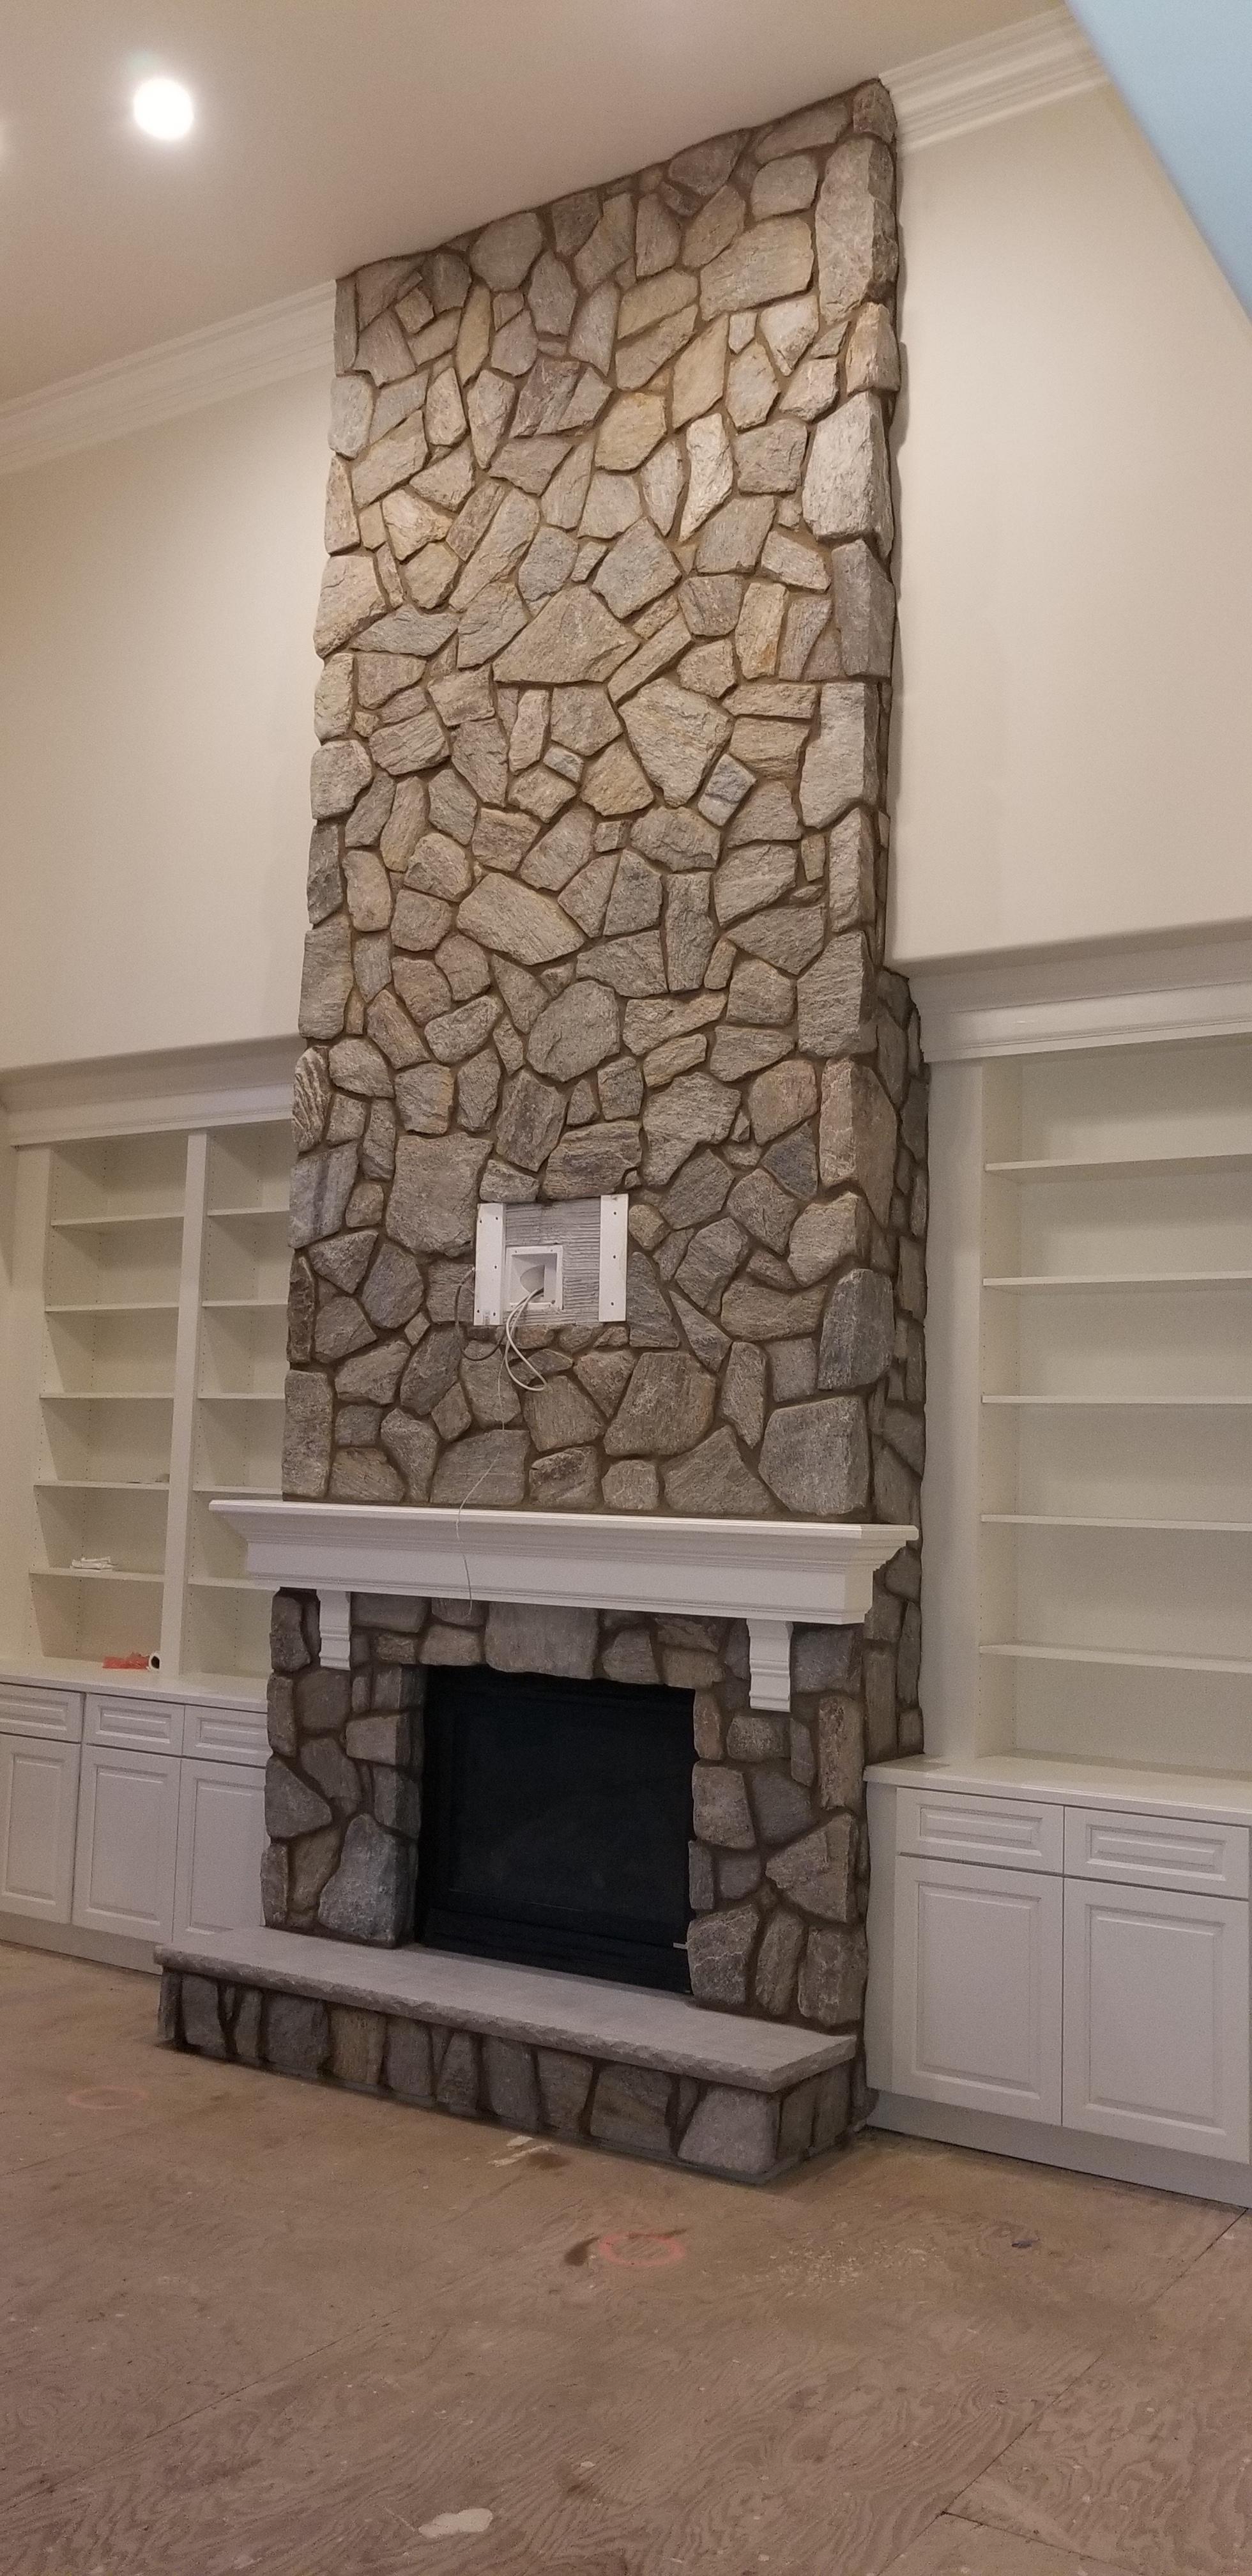 stone: Appalachian Ashlar. installer: bhr contracting